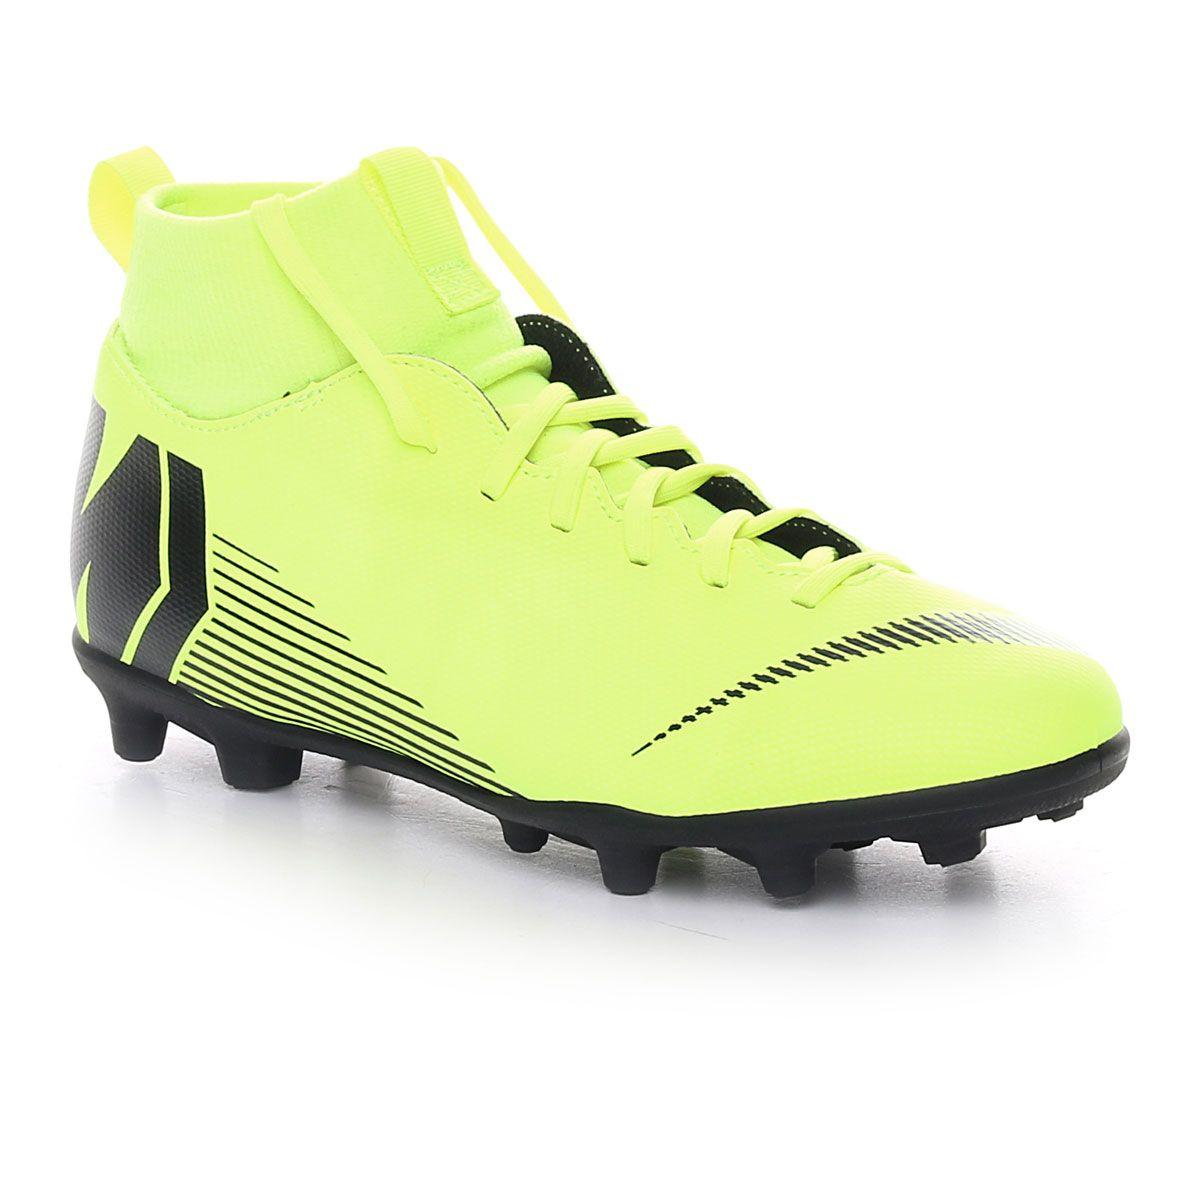 Nike Mercurial Superfly 6 Club Mg Jr Volt Black